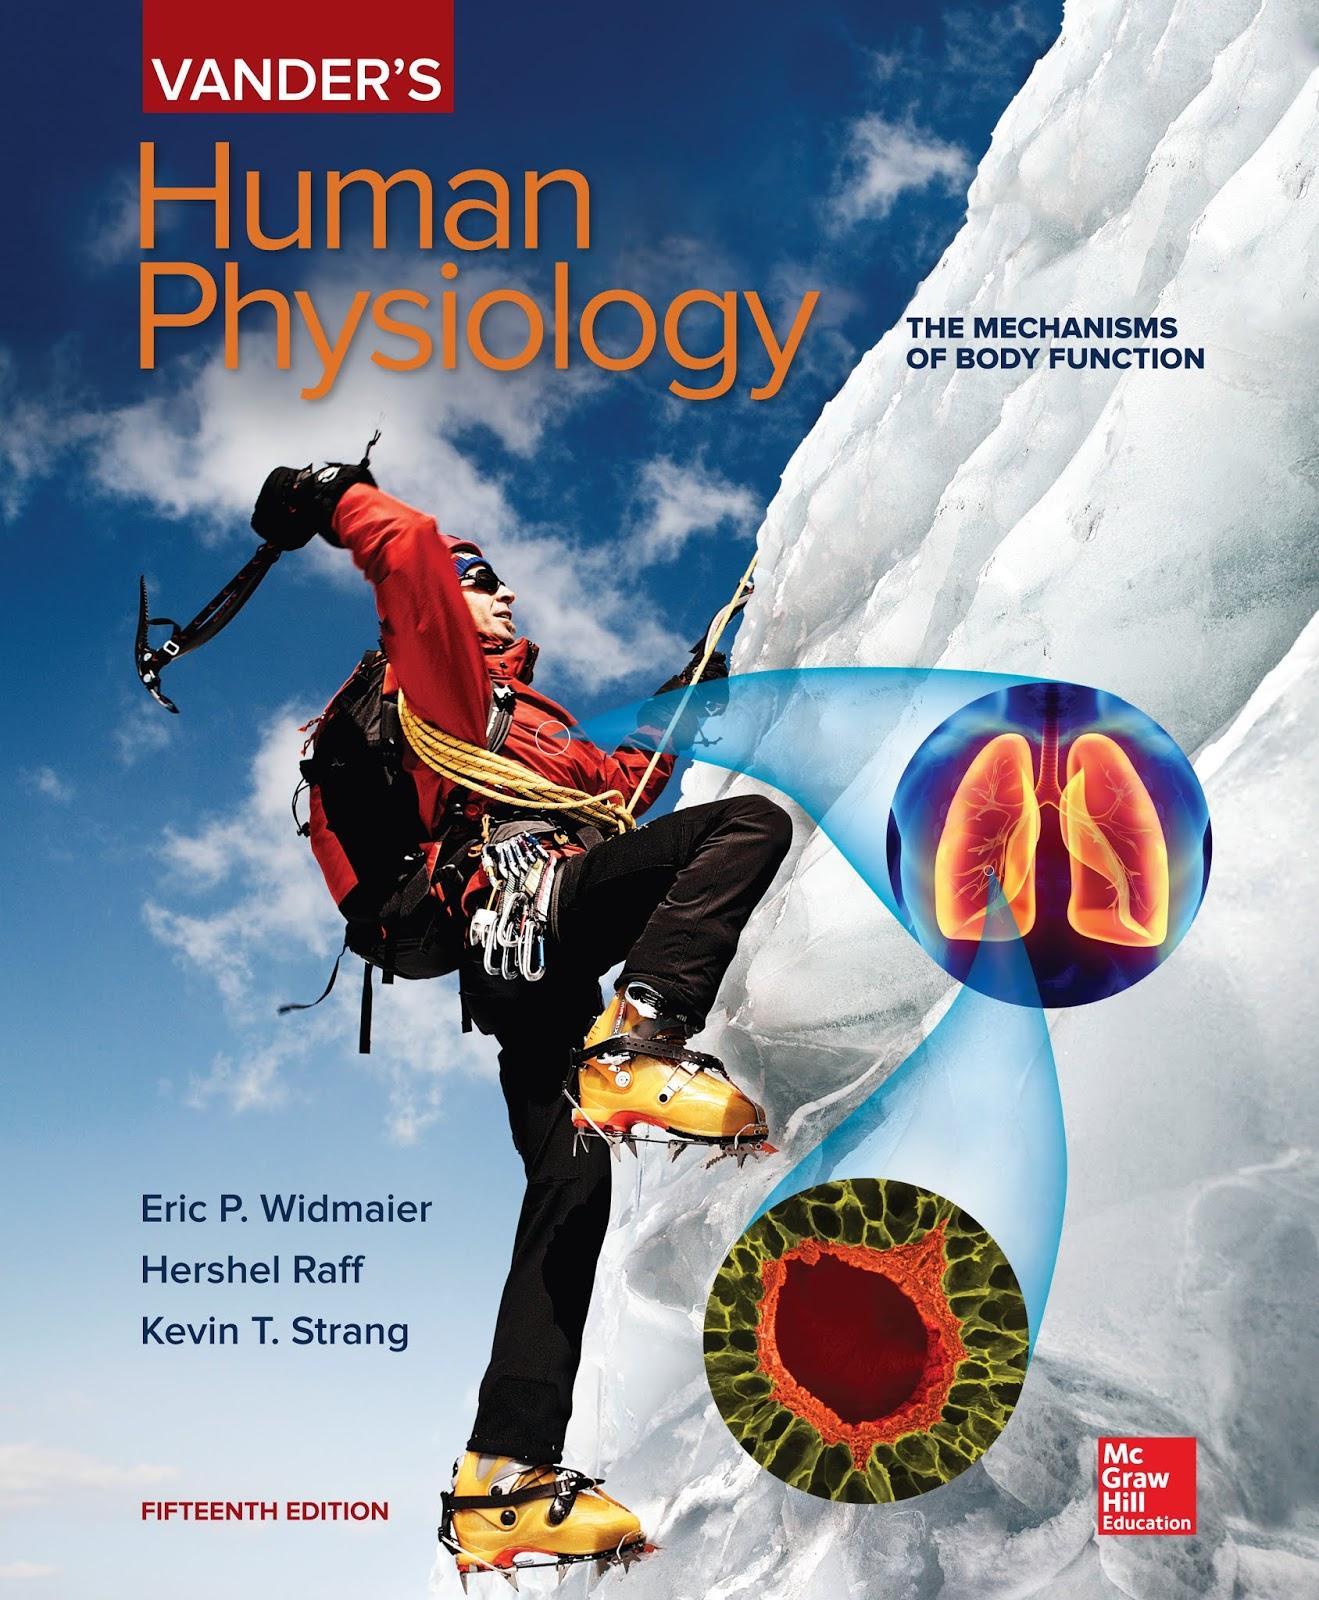 Vanders Human Physiology 15th Edition Pdf